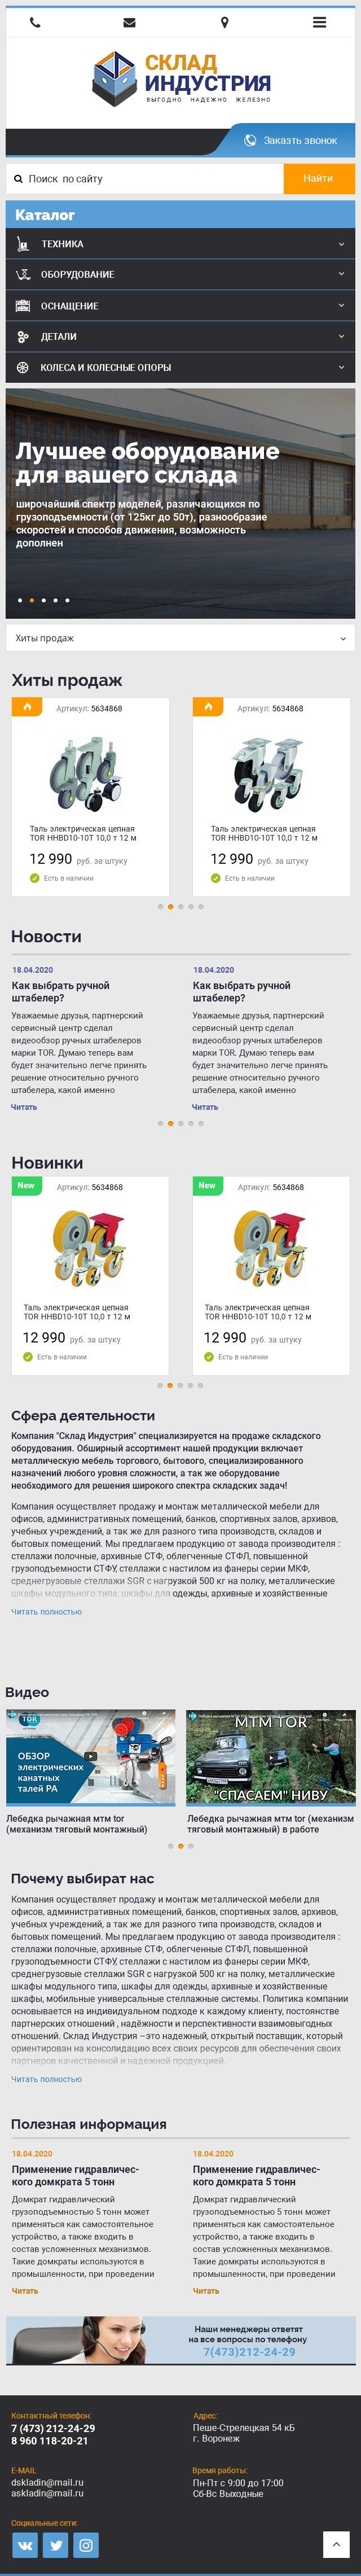 сайт торговля пример Склад индустрия 640 px